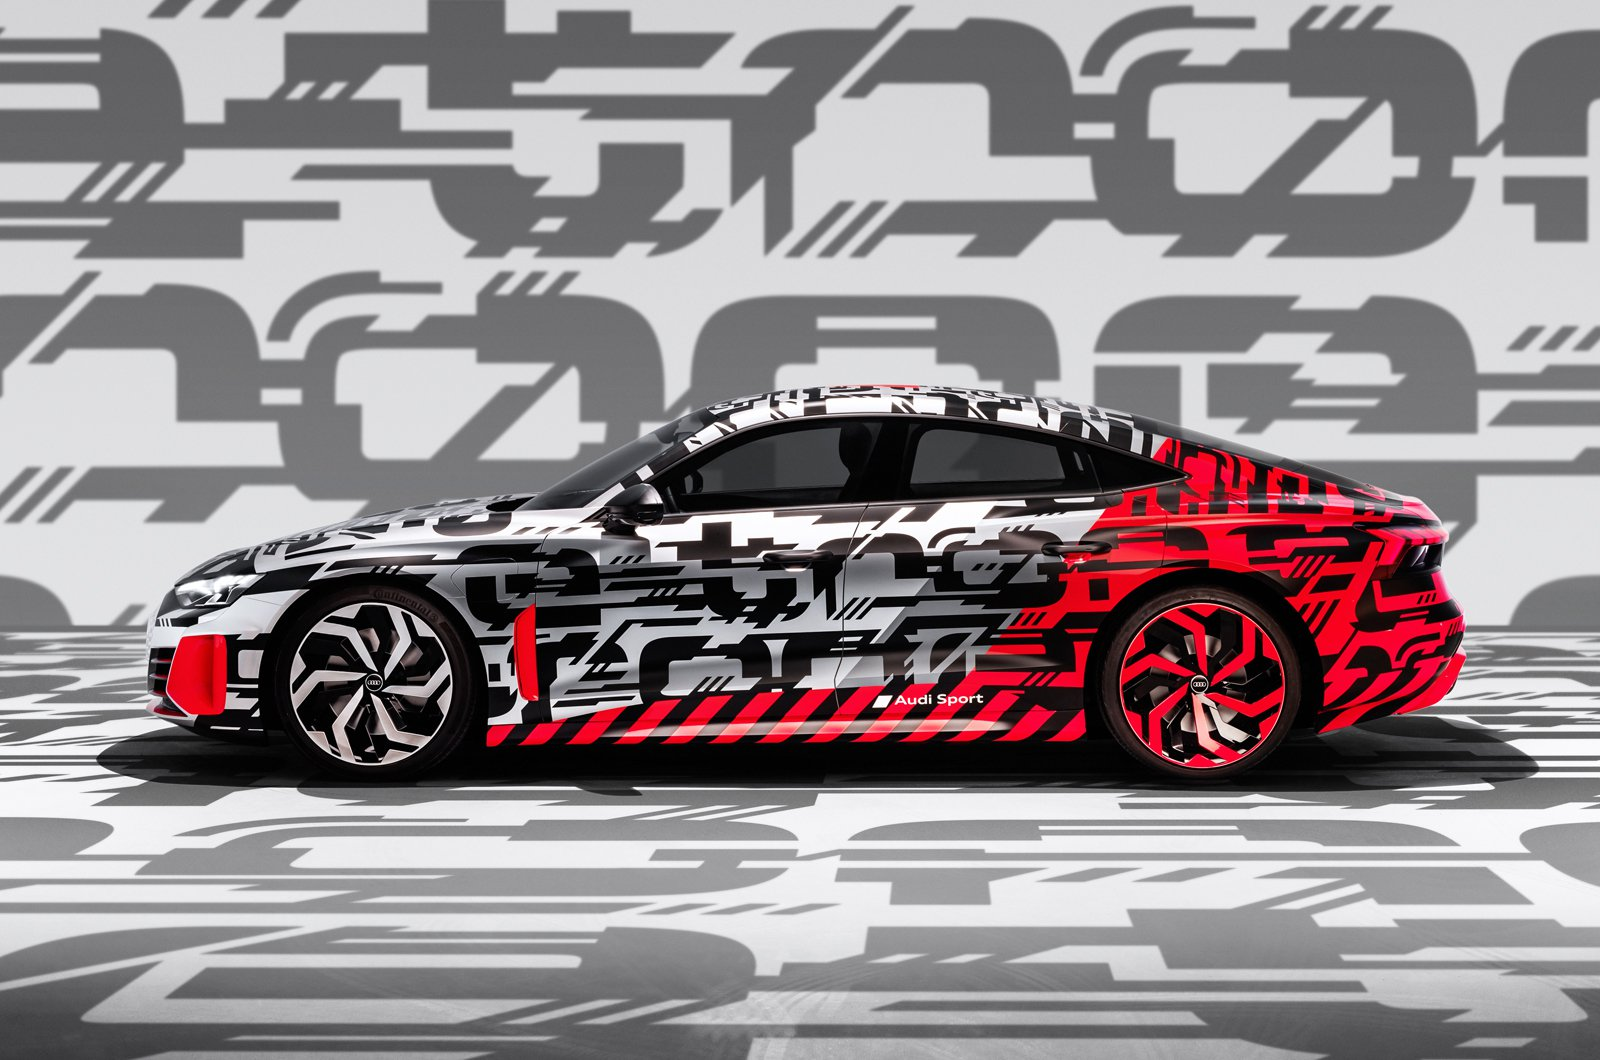 Audi E-tron GT prototype side